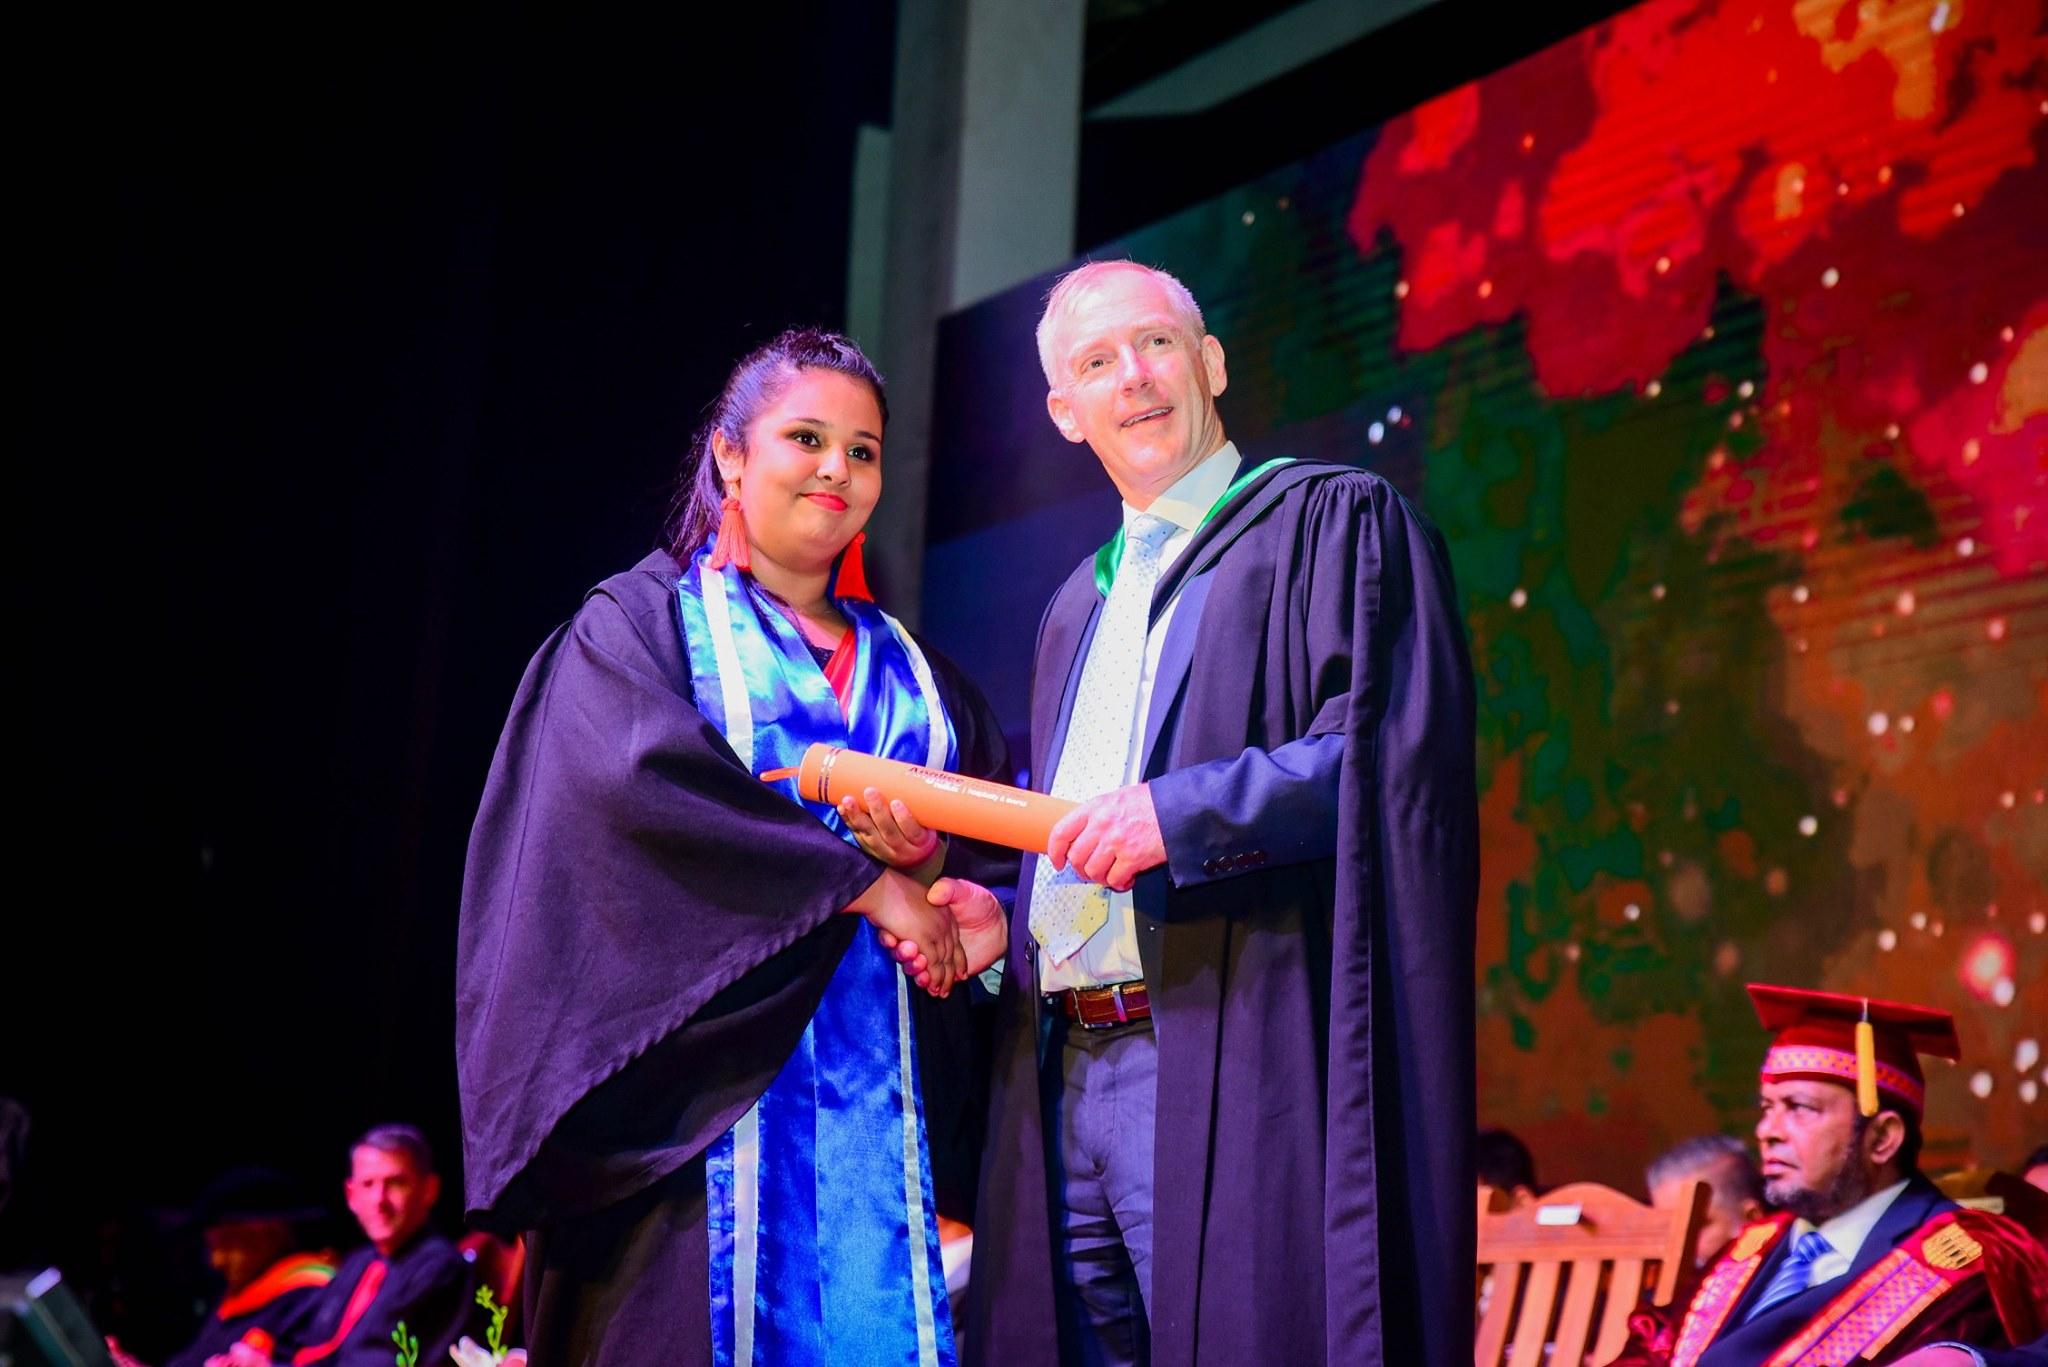 6th-graduation-ceremony-William-Angliss-Institute-at-SLIIT-